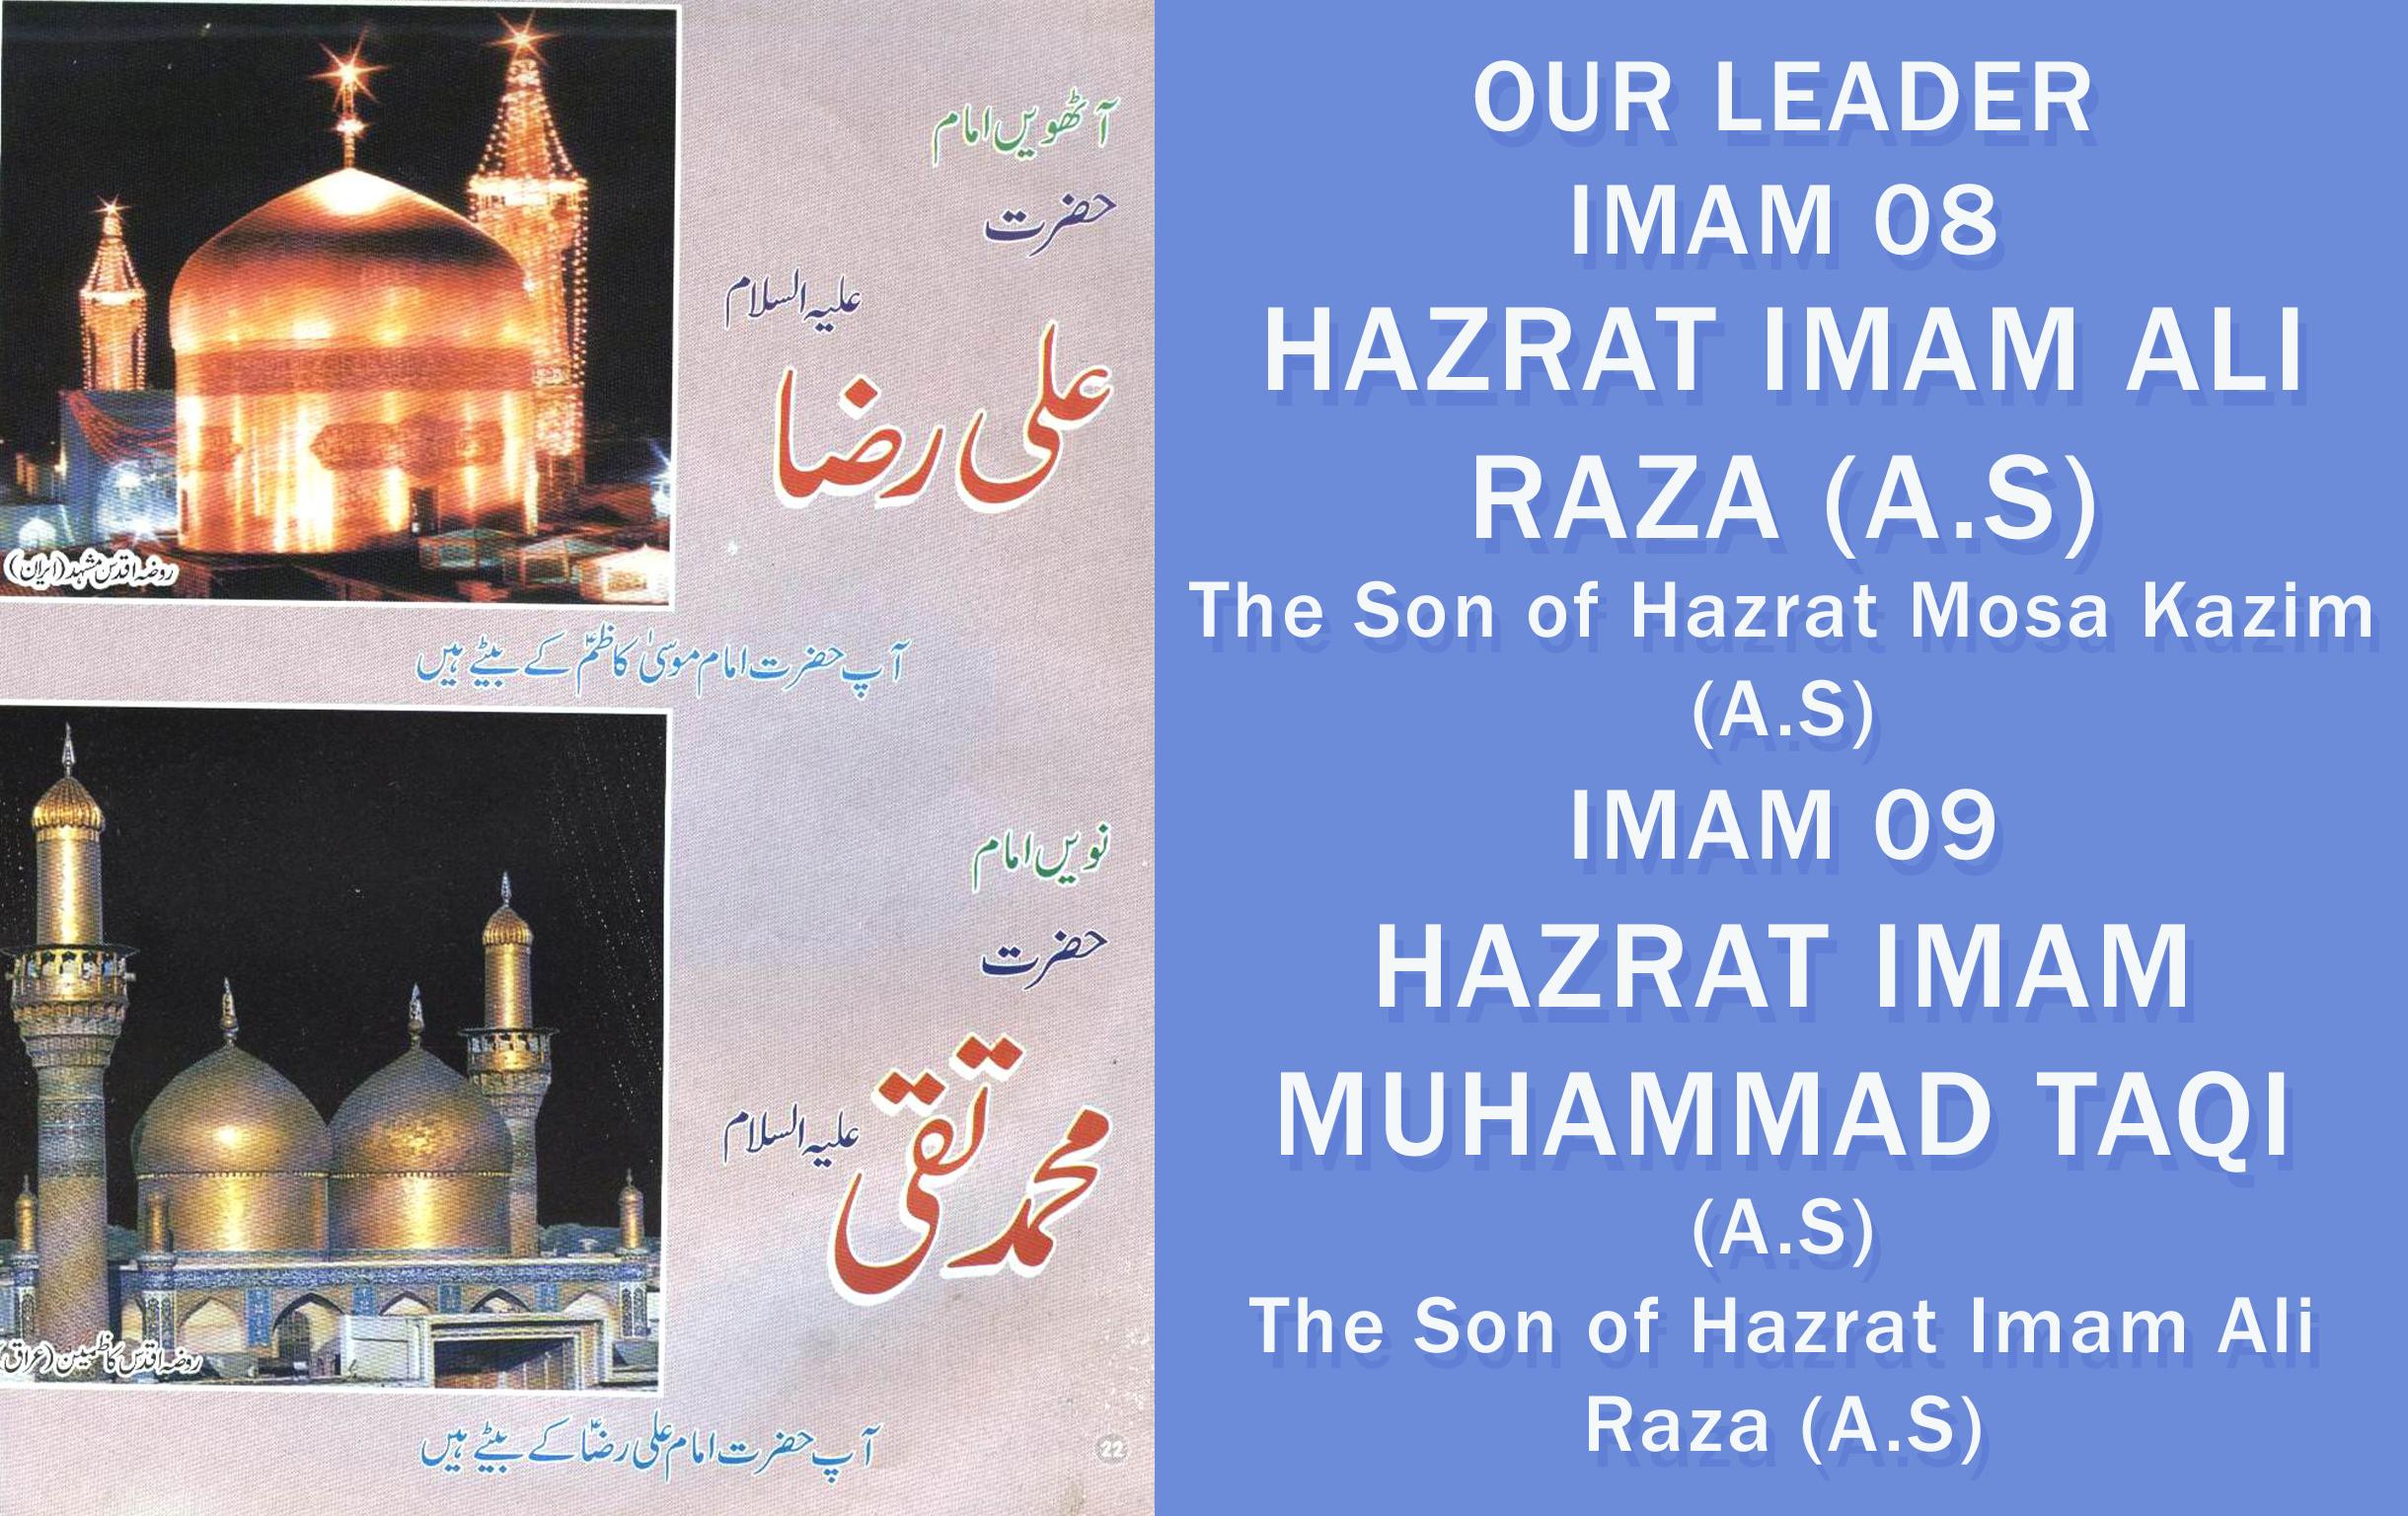 Hazrat Imam Ali Raza A.S / Hazrat Imam Muhamamd Taqi A.S